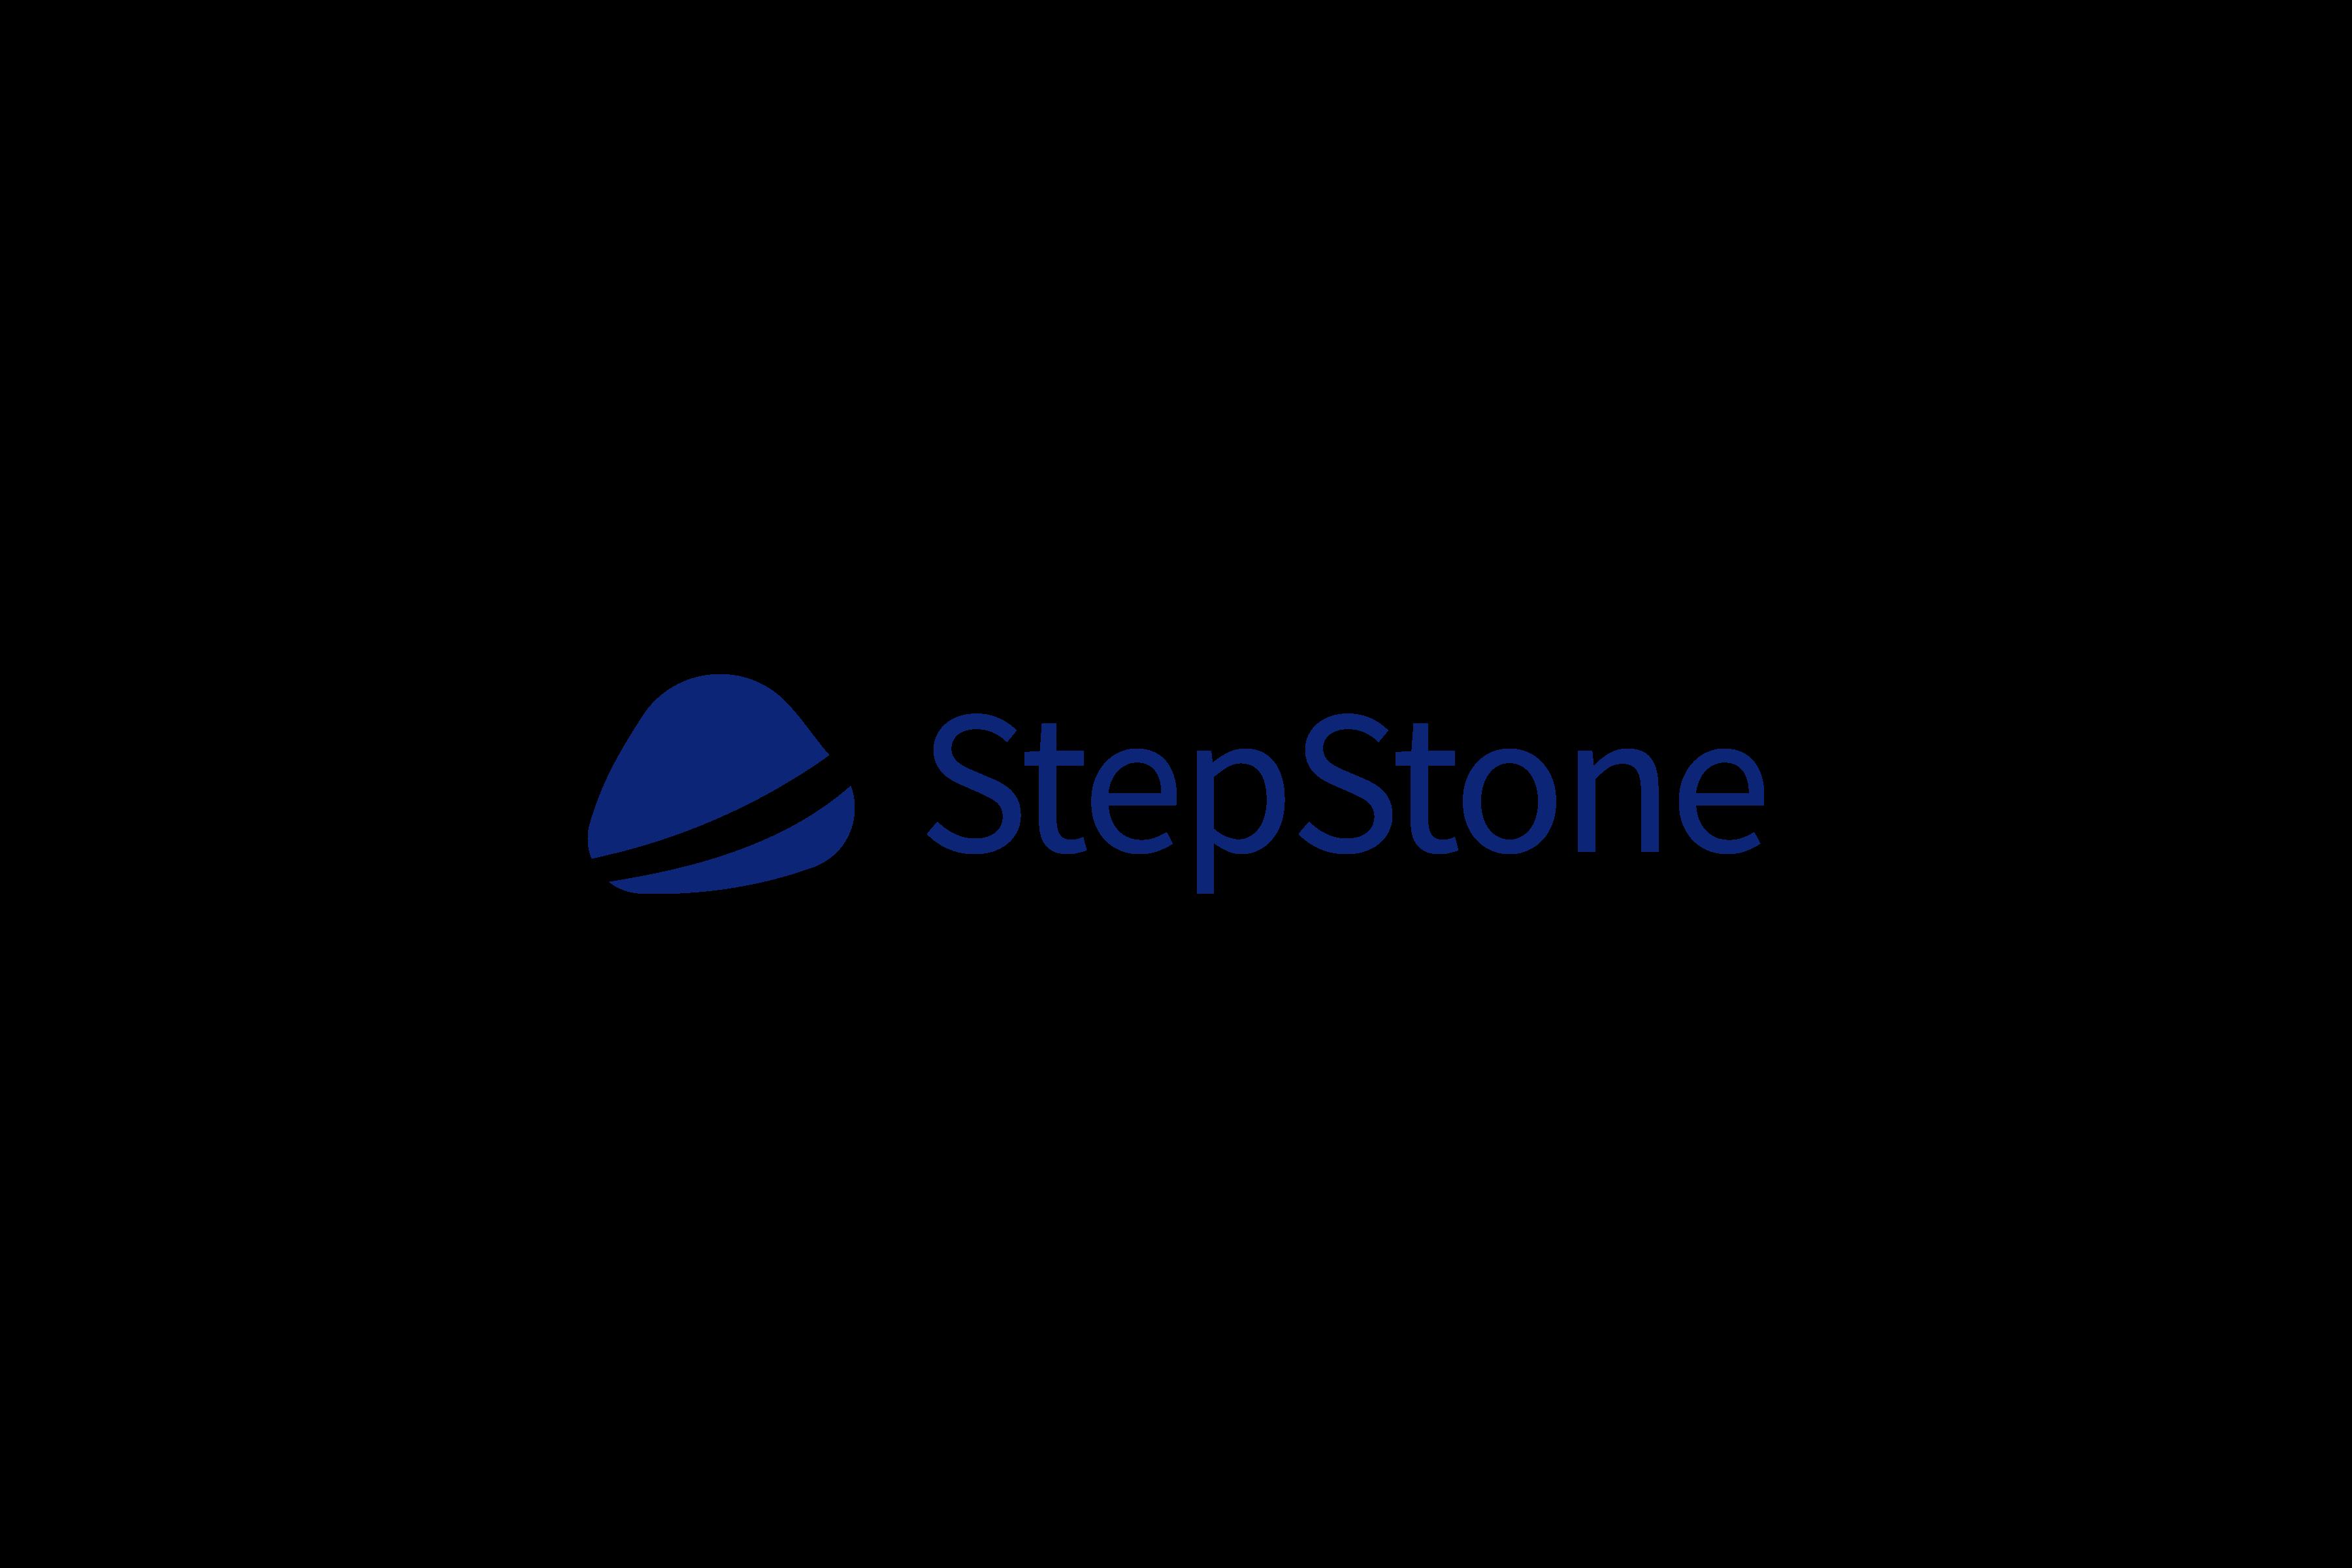 StepStone, Step Stone